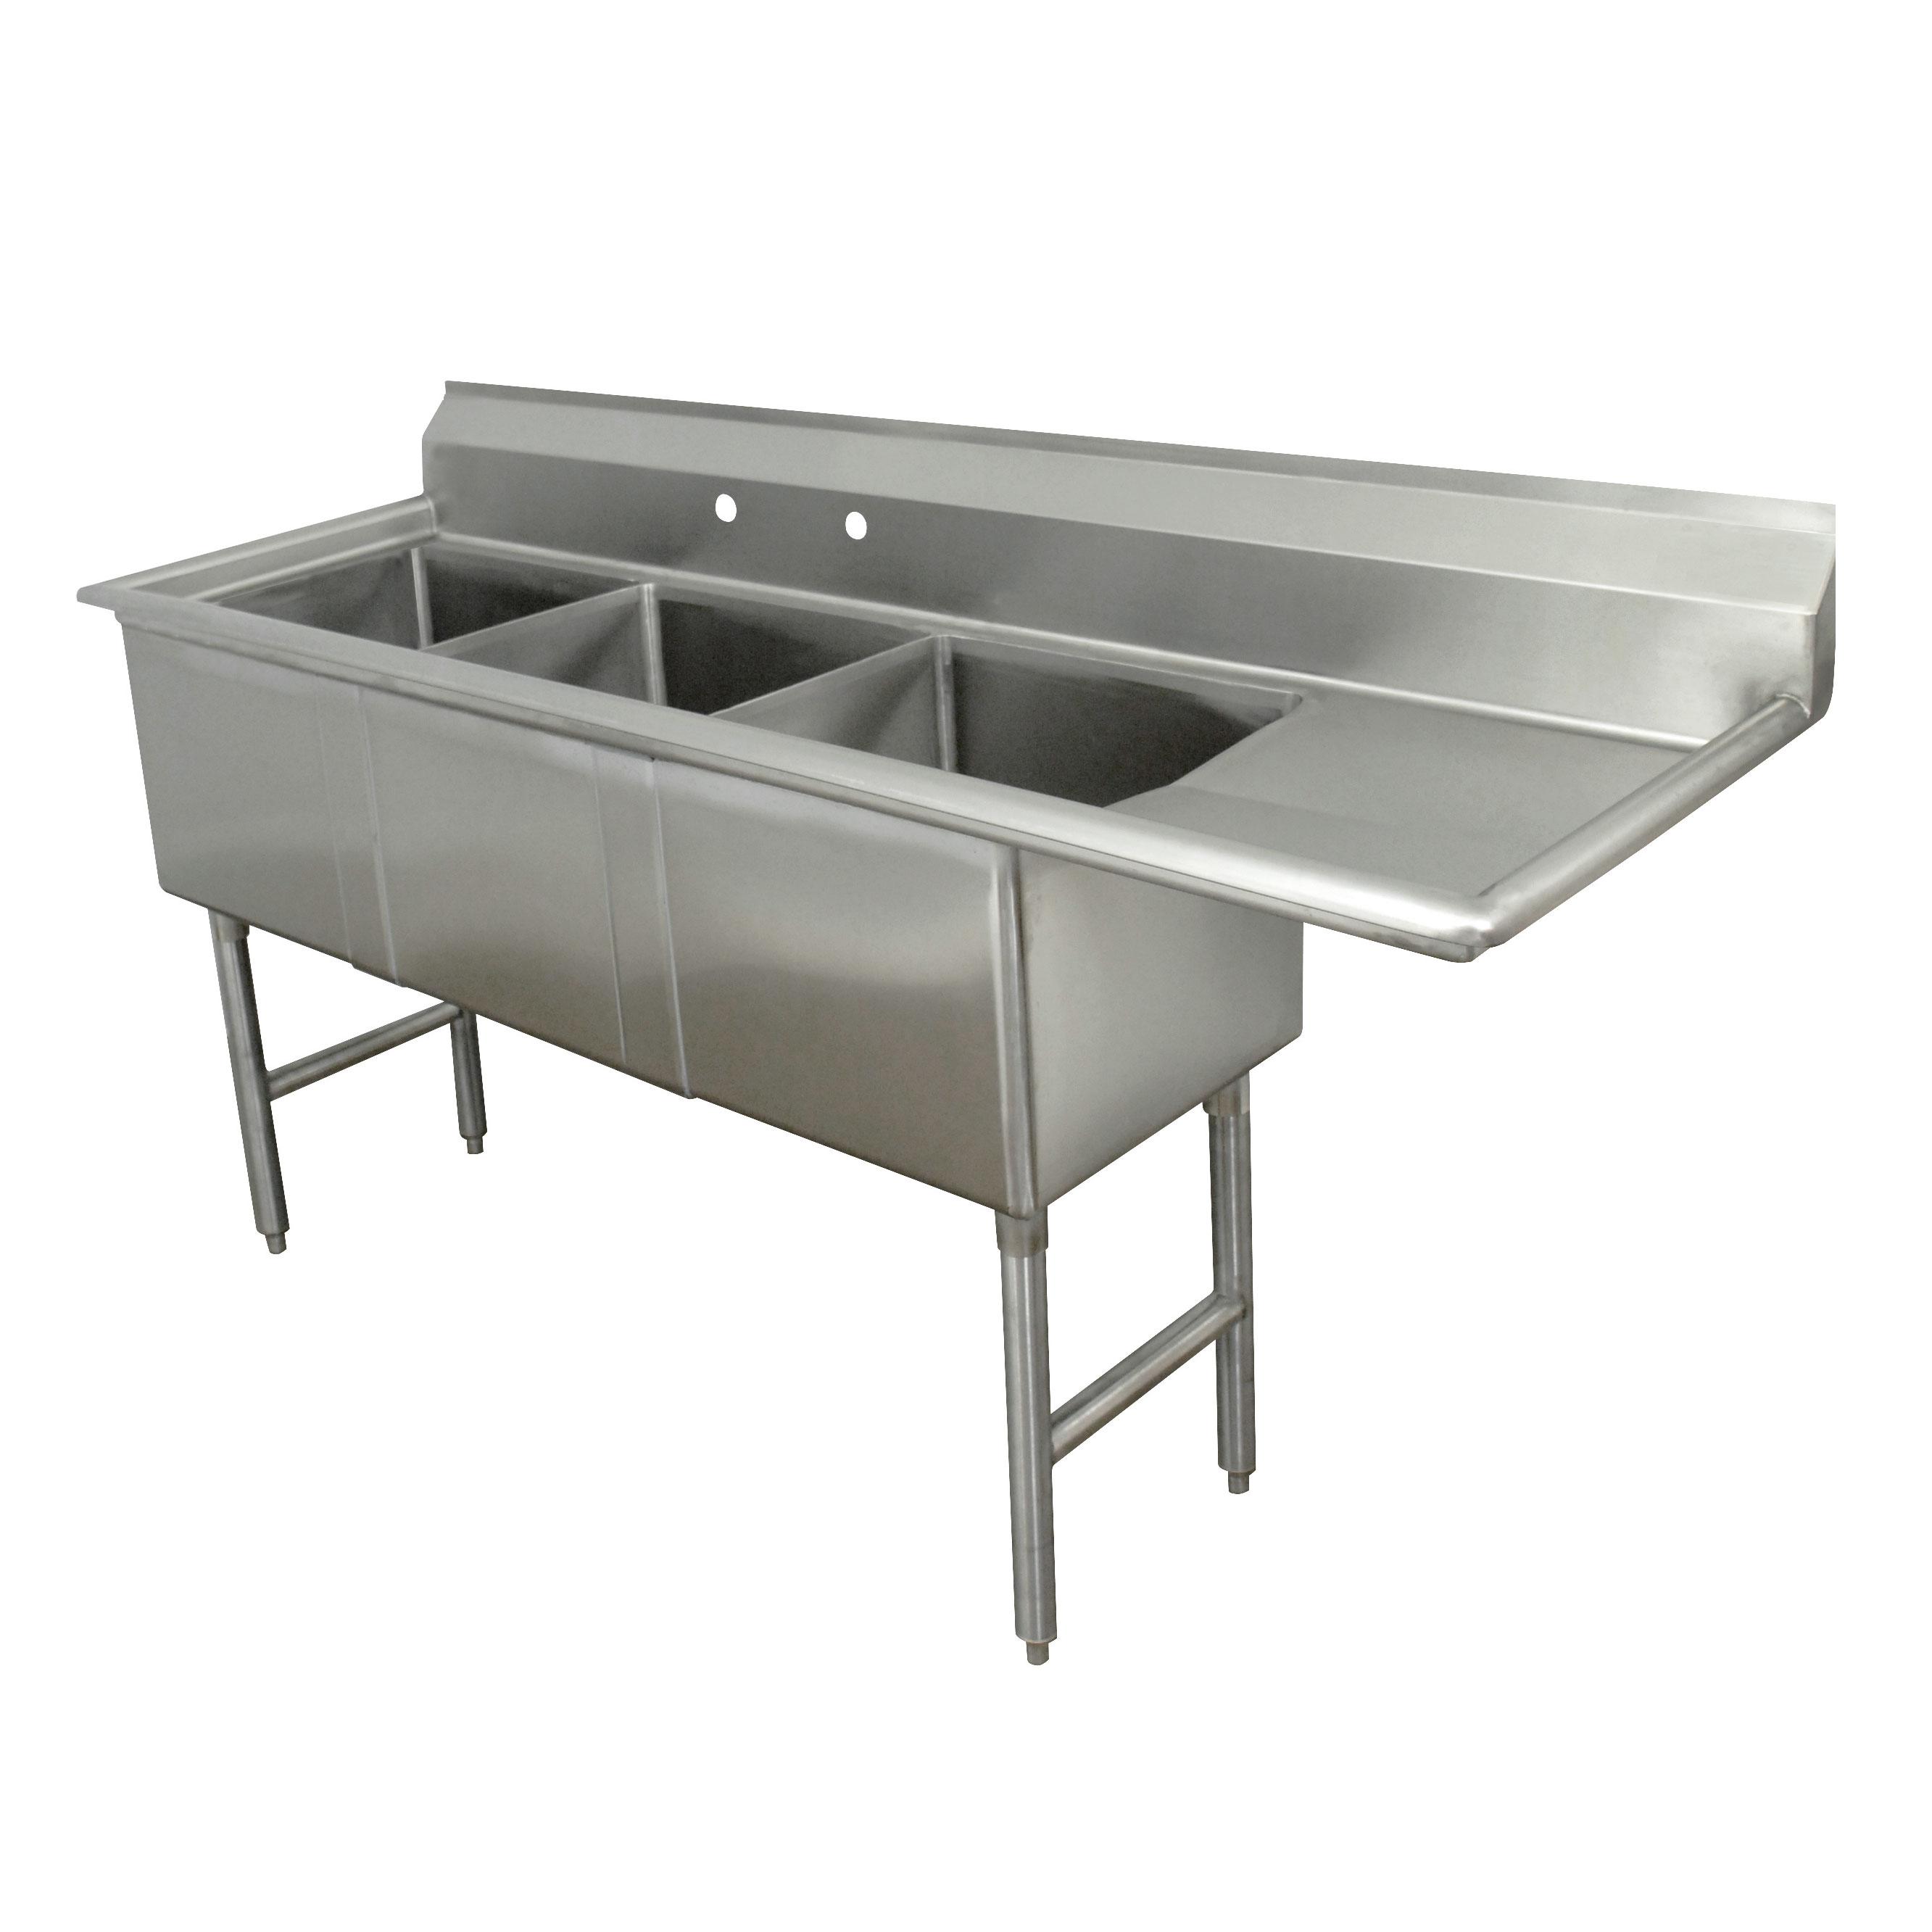 Advance Tabco FC-3-2430-30R sink, (3) three compartment